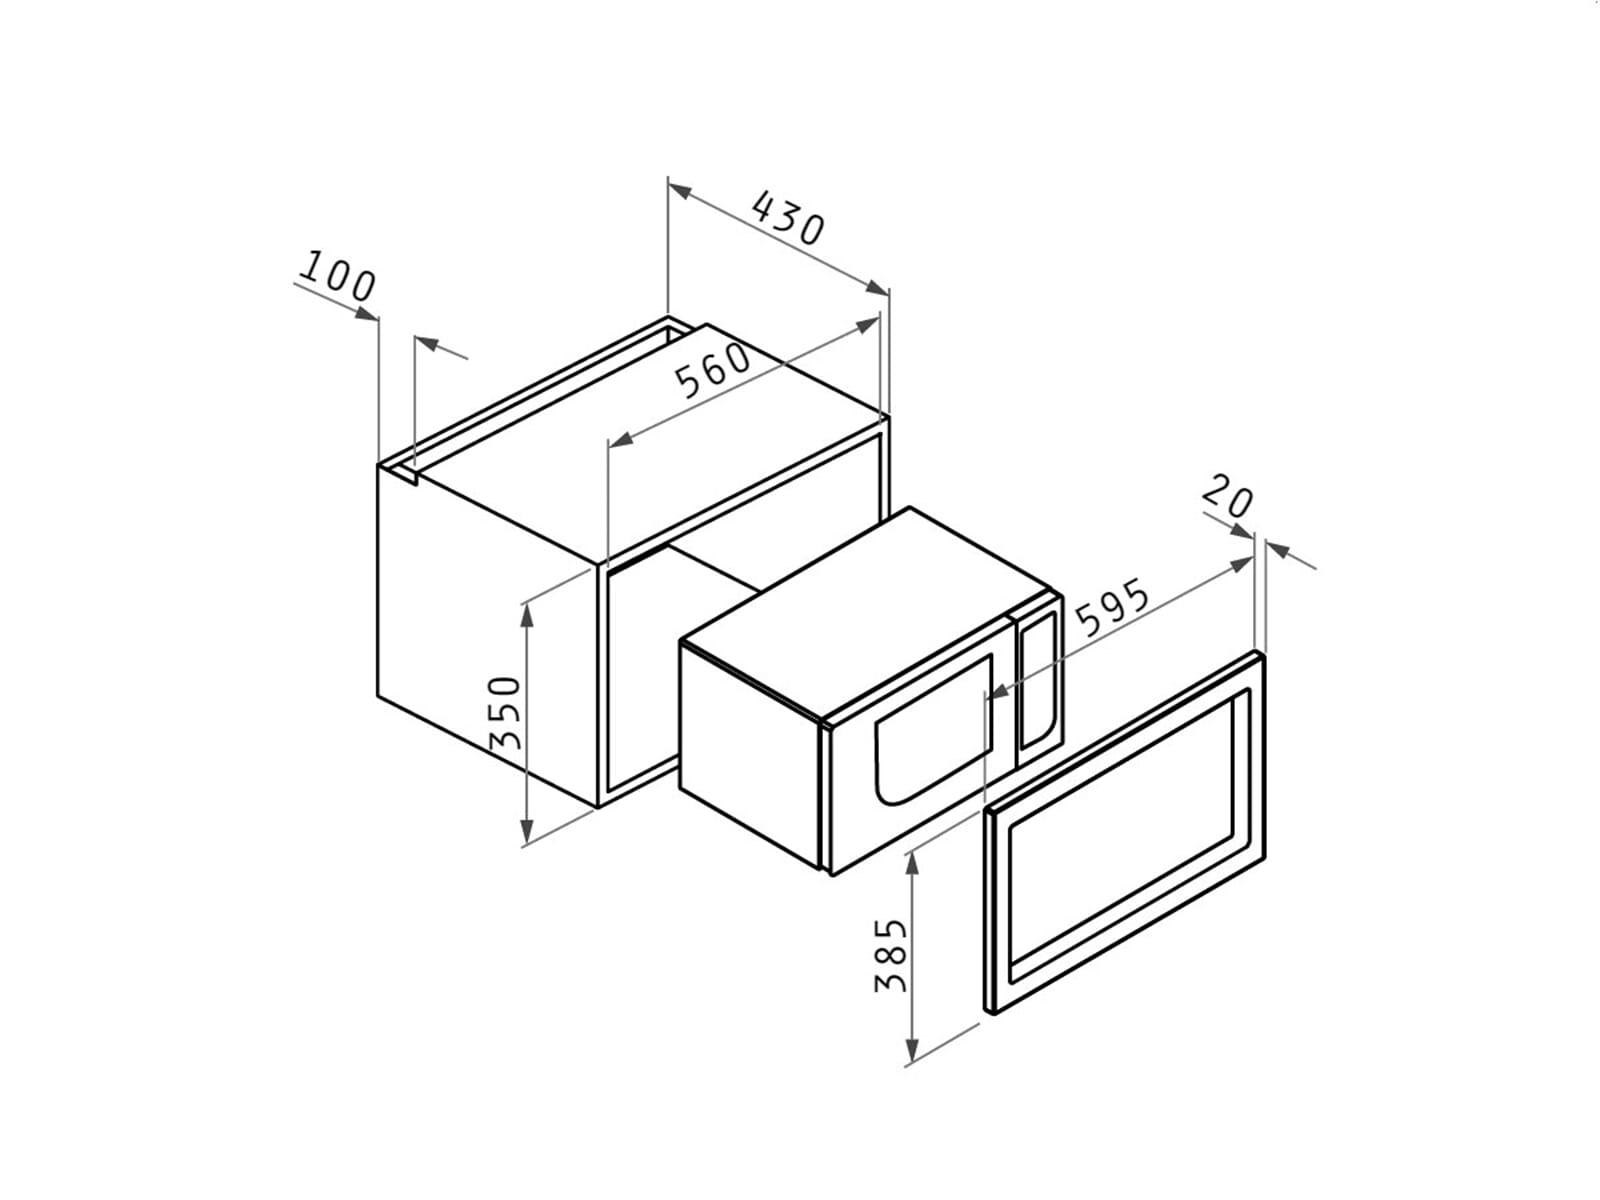 pyramis 034012101 einbau mikrowelle mit grill edelstahl f r 144 90. Black Bedroom Furniture Sets. Home Design Ideas